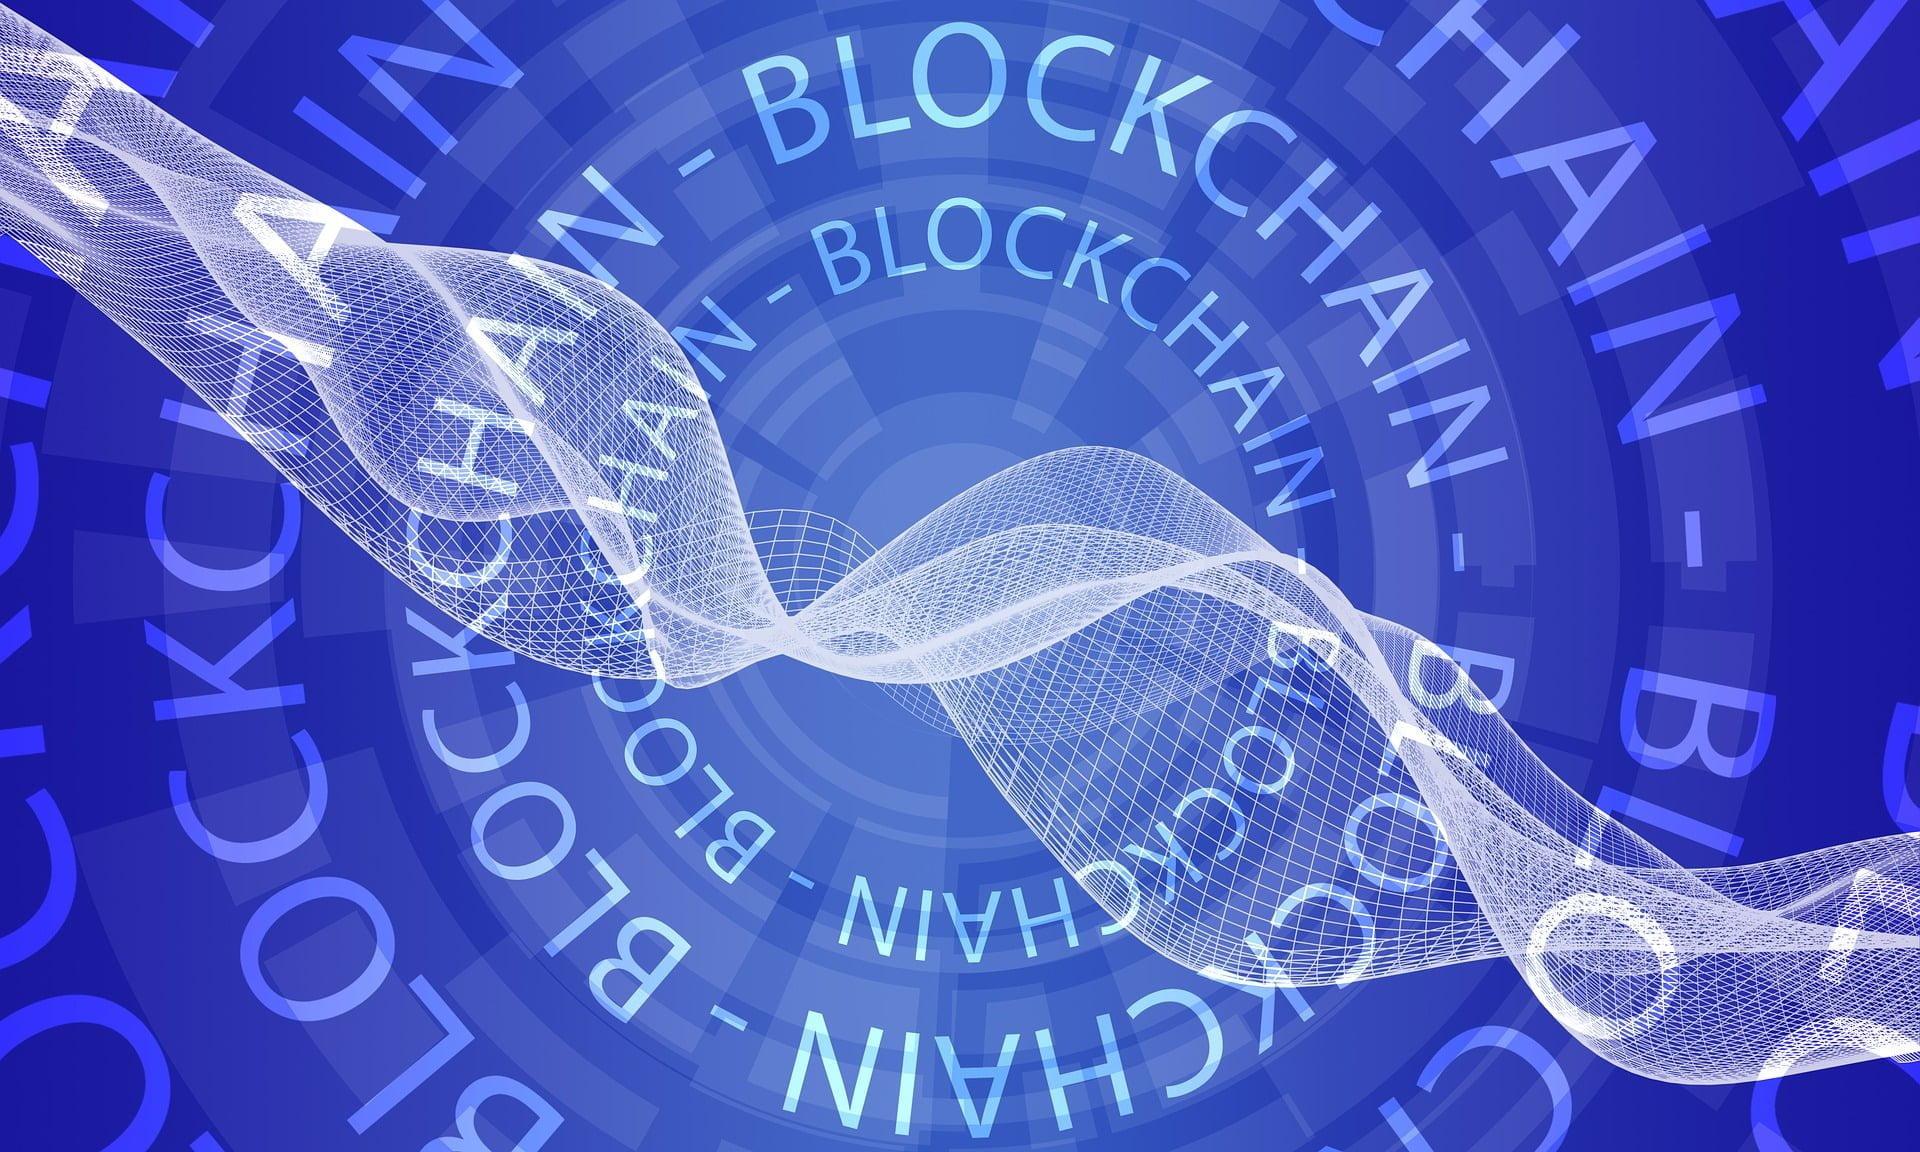 Blockchain is Revolutionizing Hedge Funds